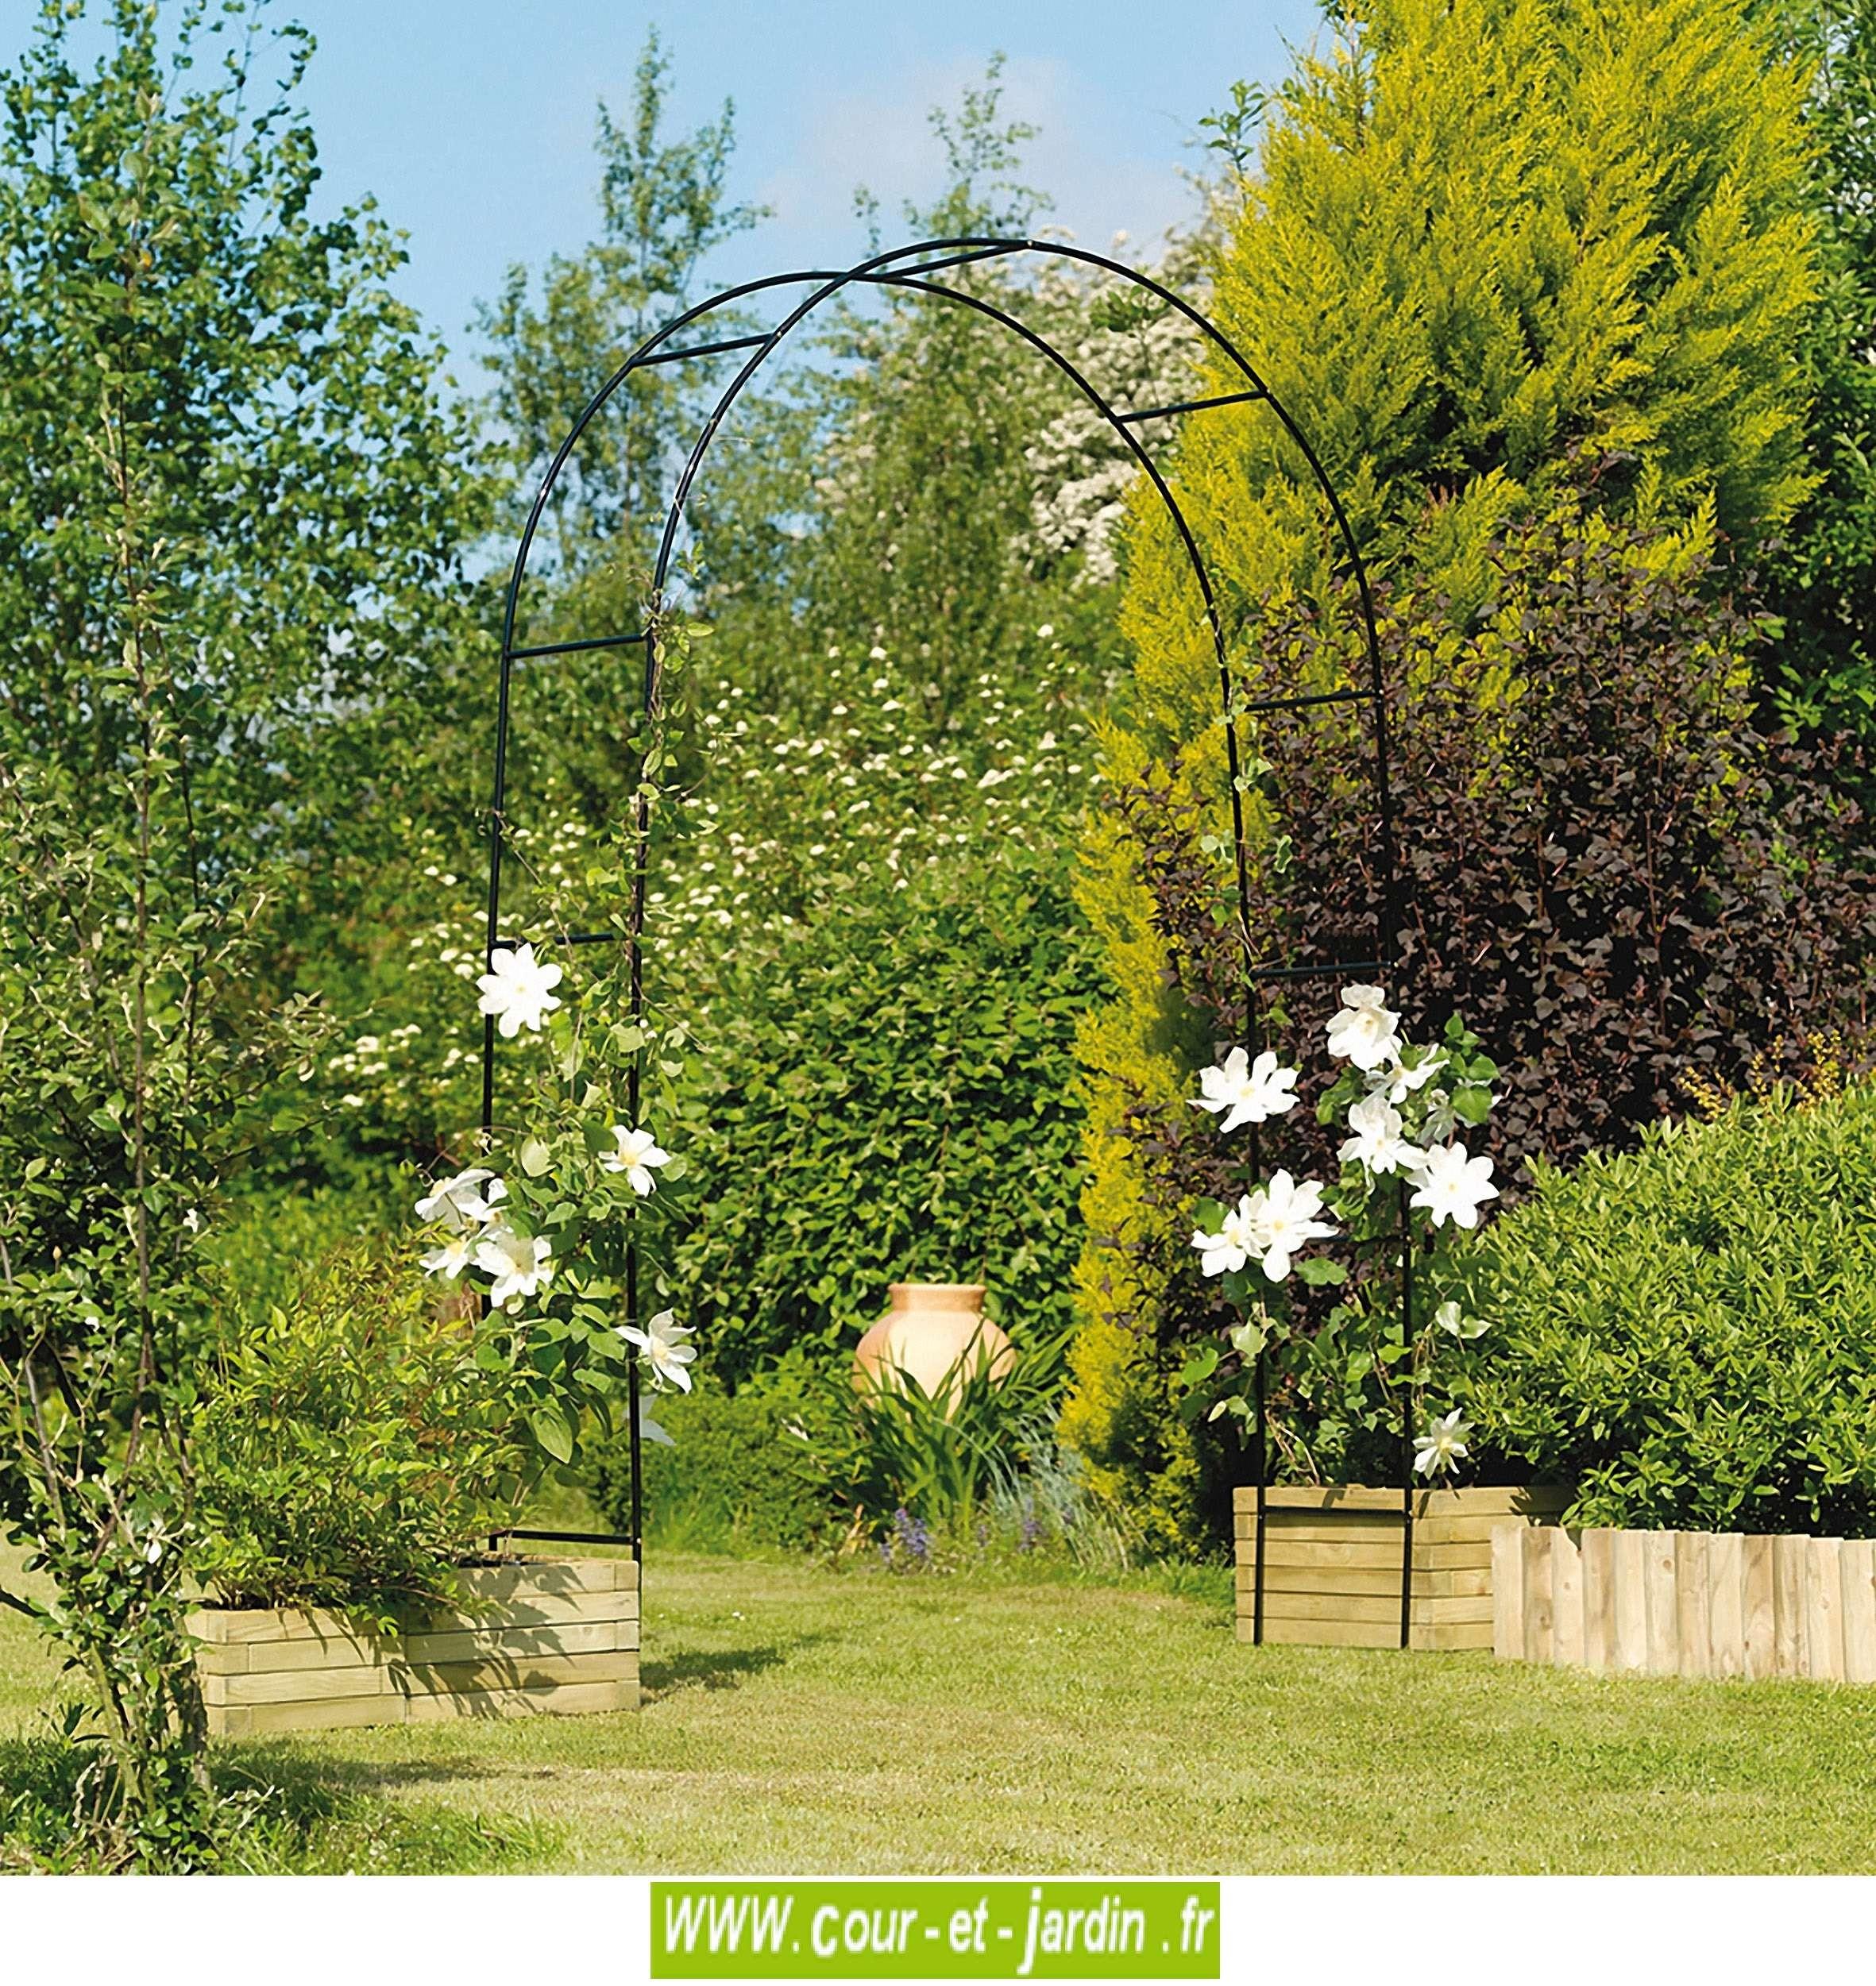 Arche De Jardin, En Métal Easy Arch - Pergola De Jardin ... serapportantà Arche Pour Jardin